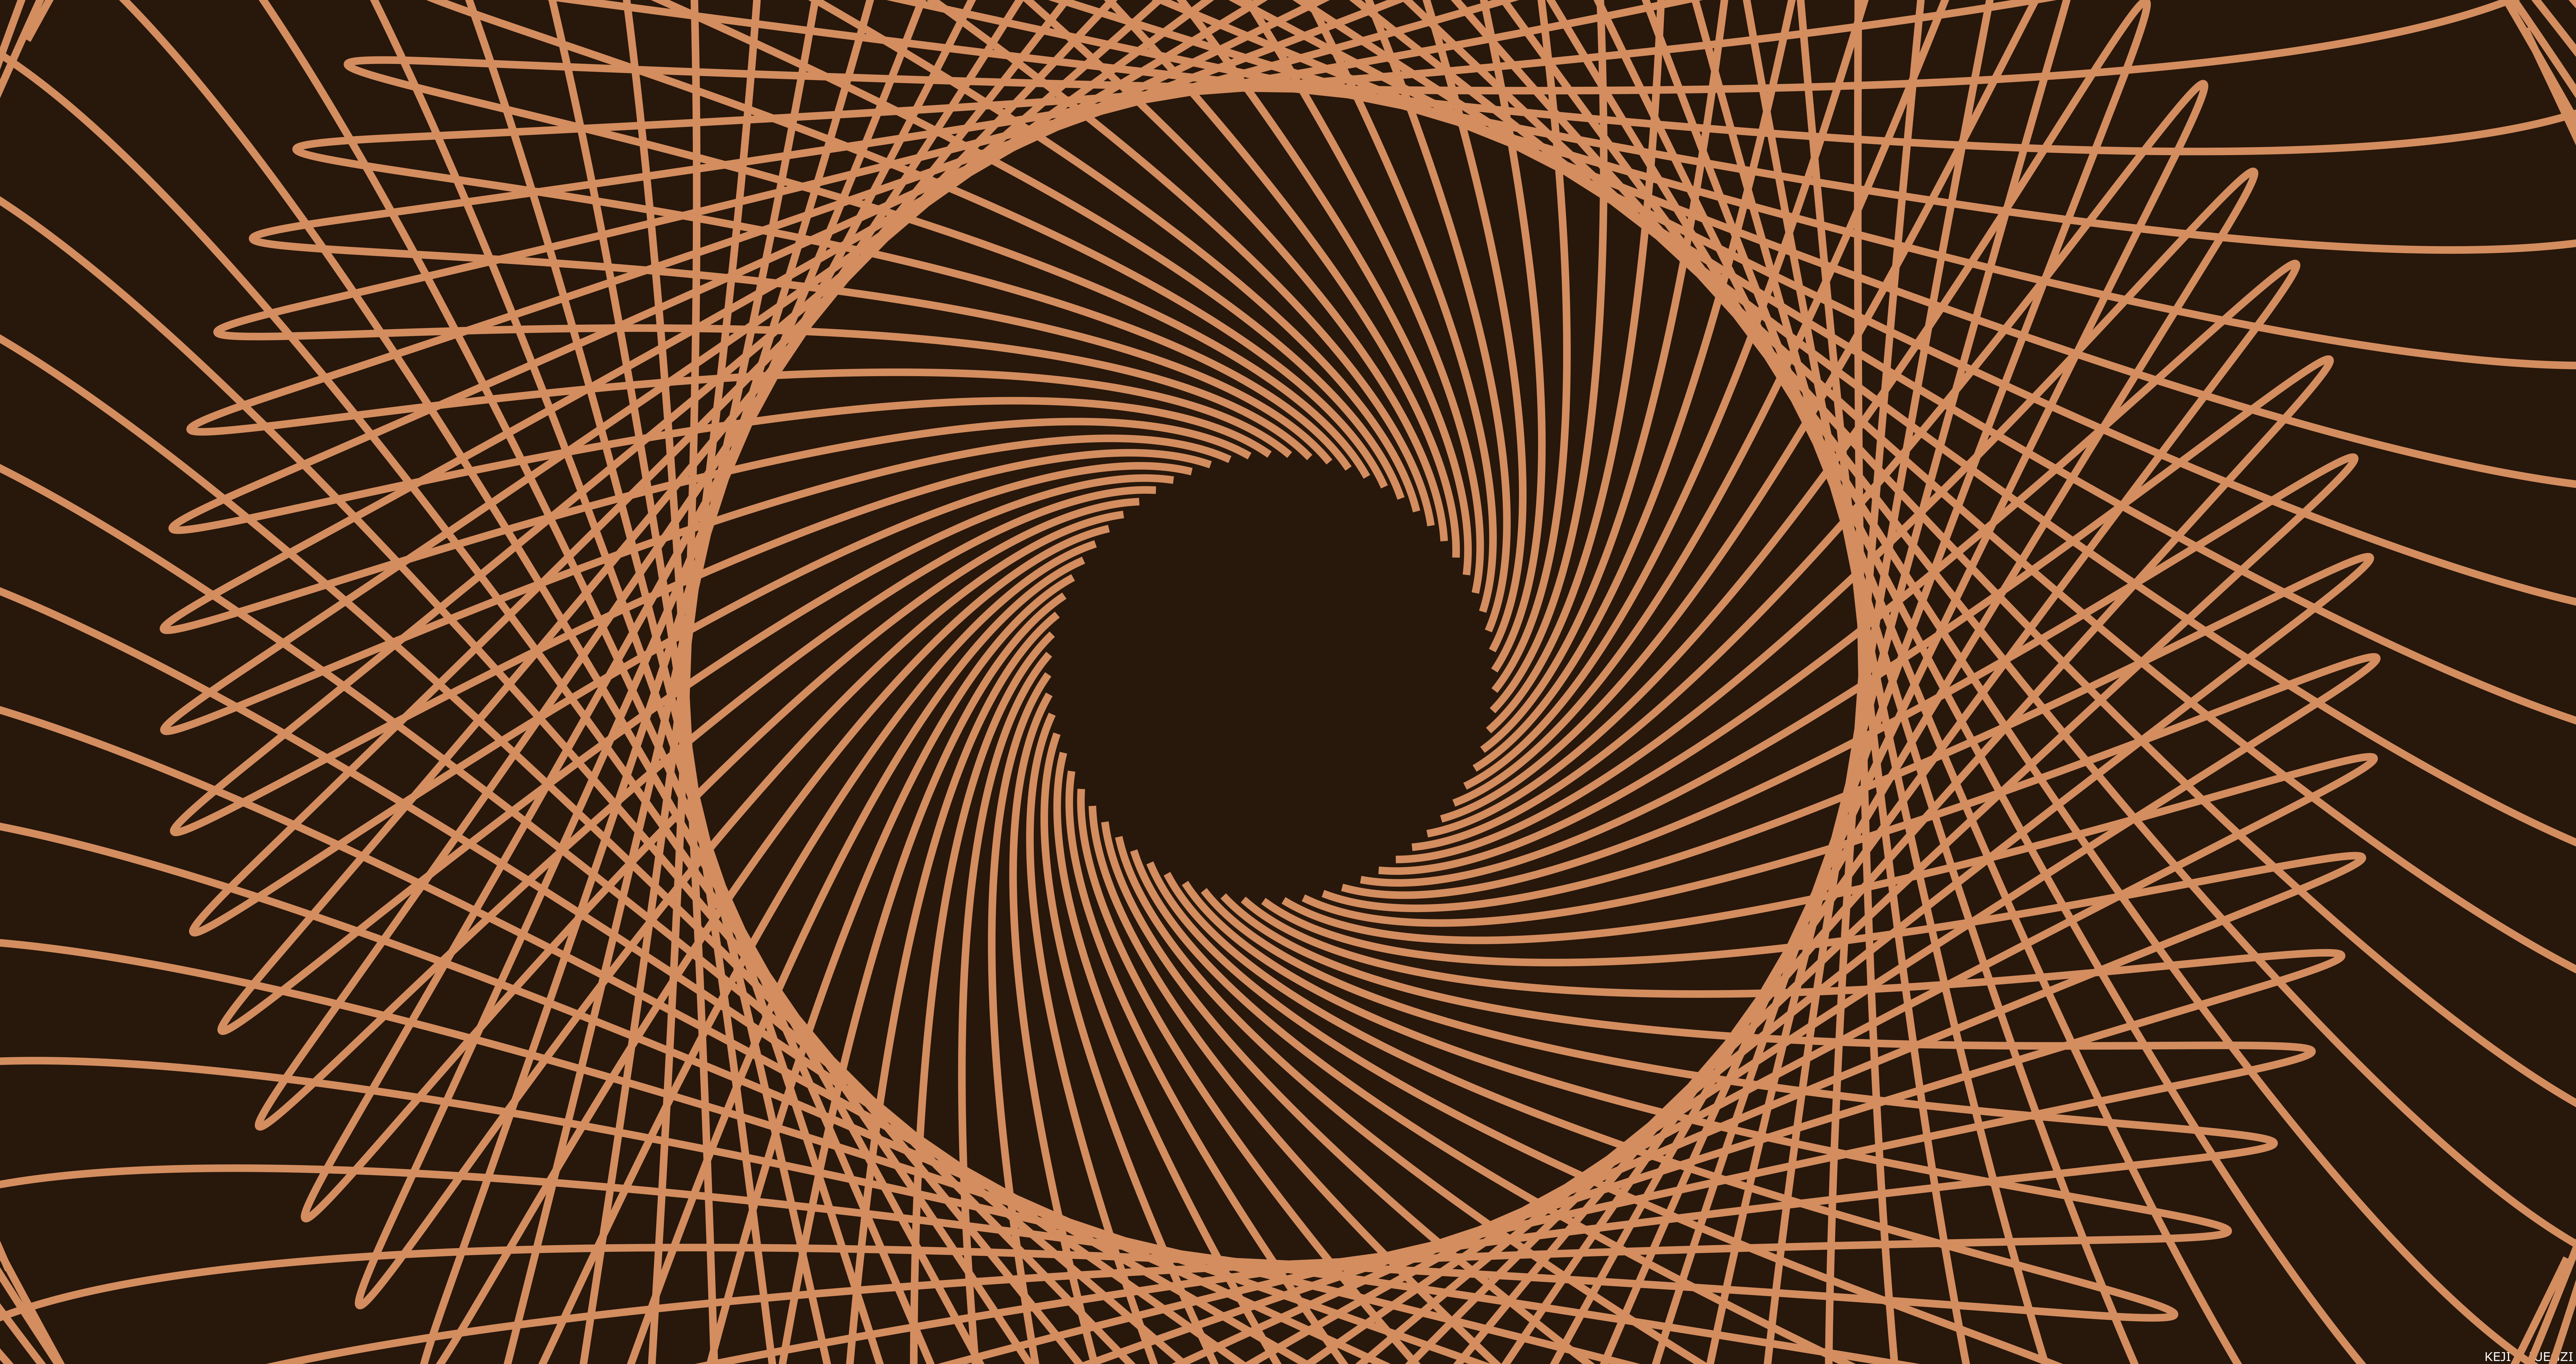 Digital Art Lines Spiral 8500x4500